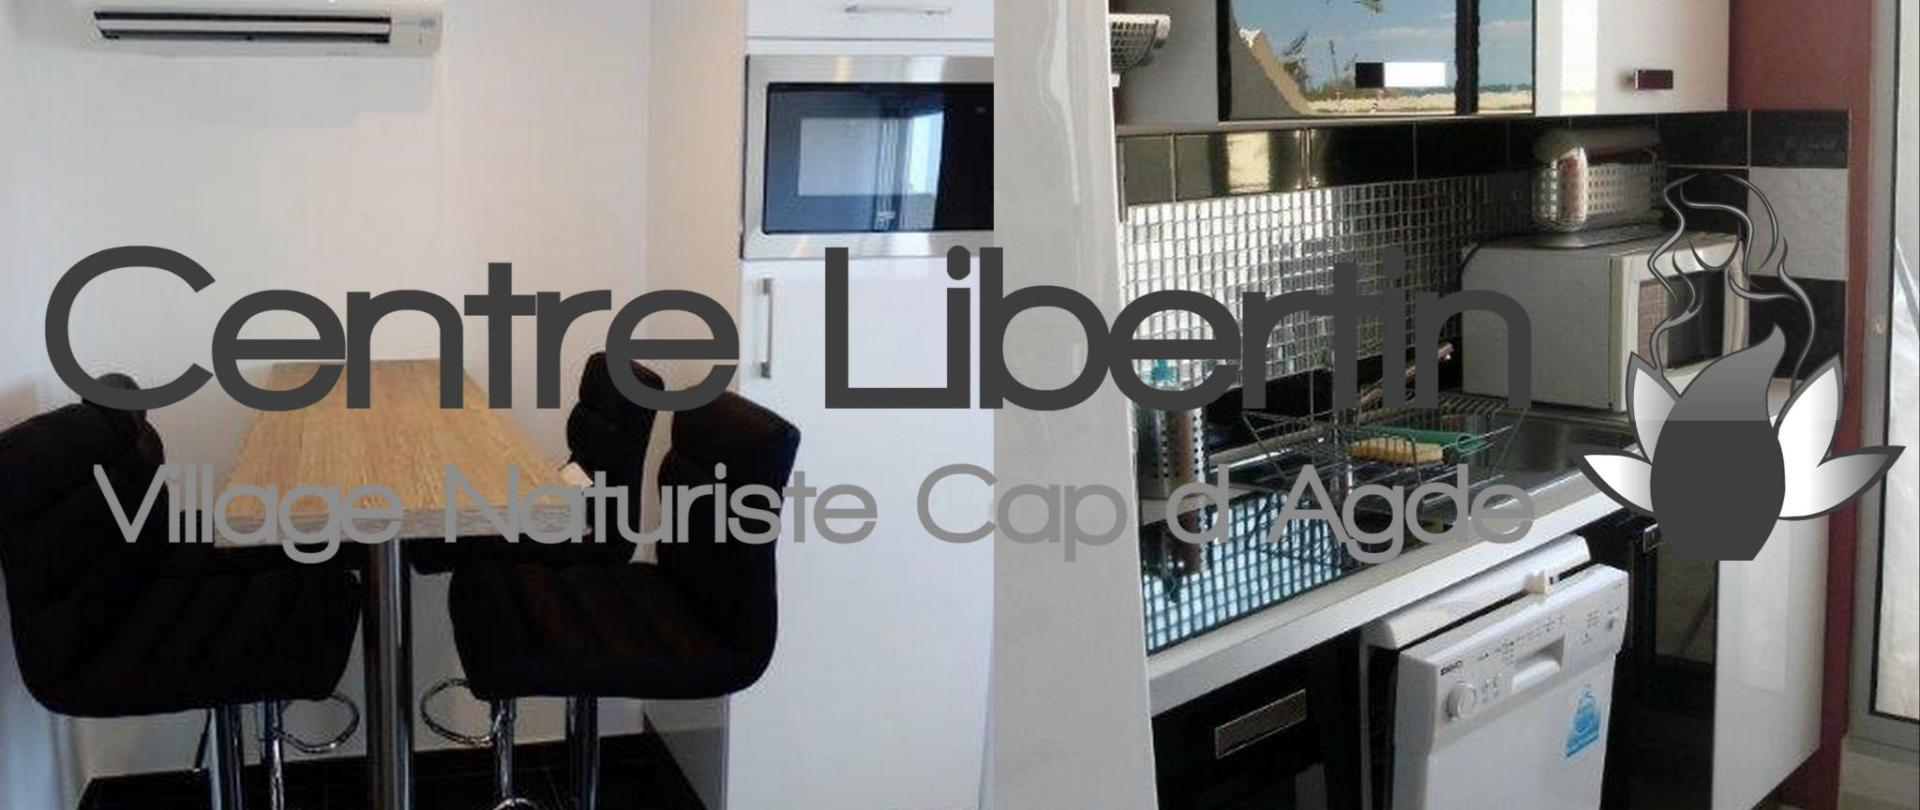 Centre Libertin R5 29.jpg